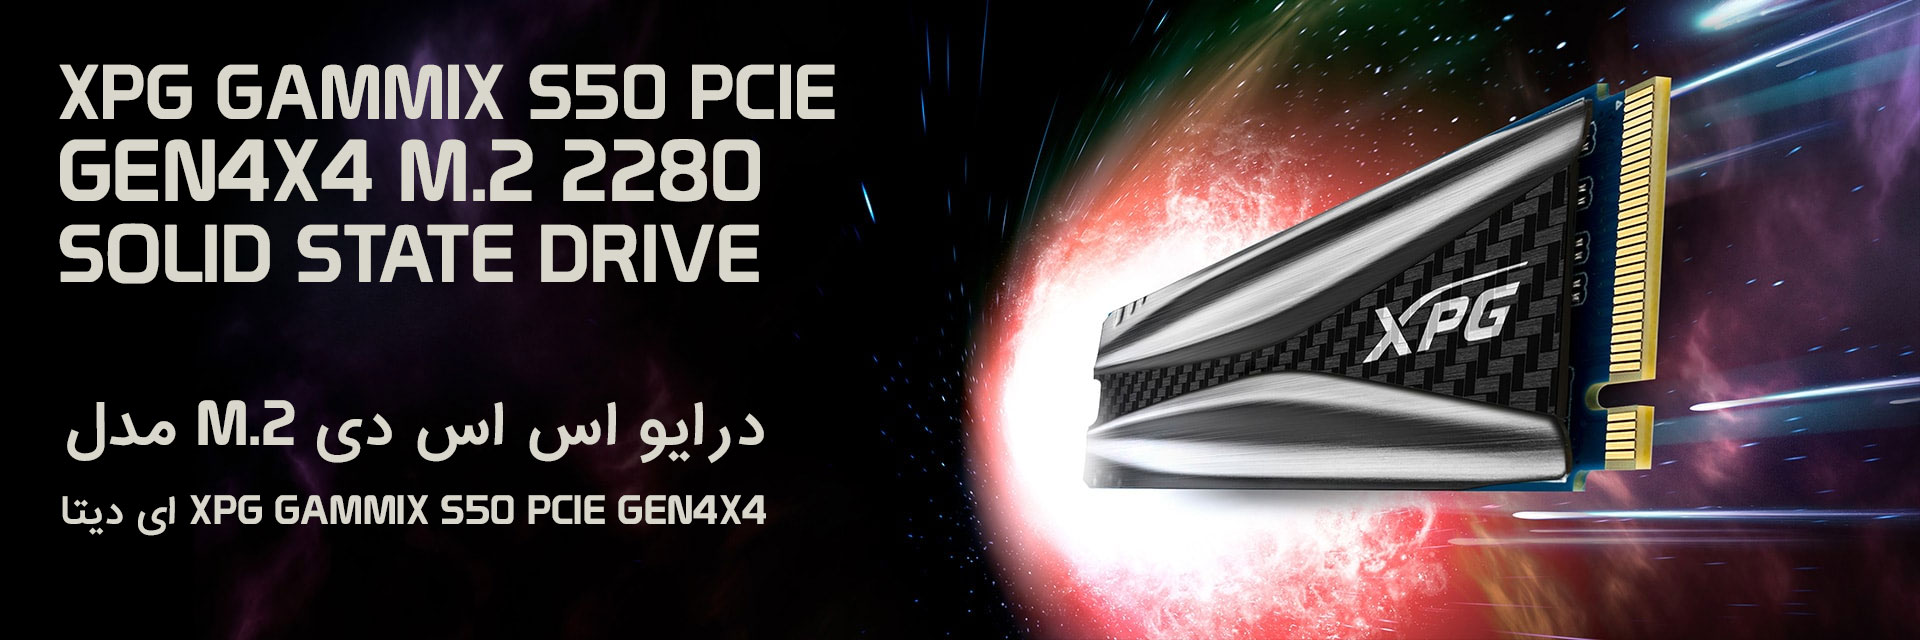 اس اس دی اینترنال ایکس پی جی مدل GAMMIX S50 PCIe Gen3x4 M.2 2280